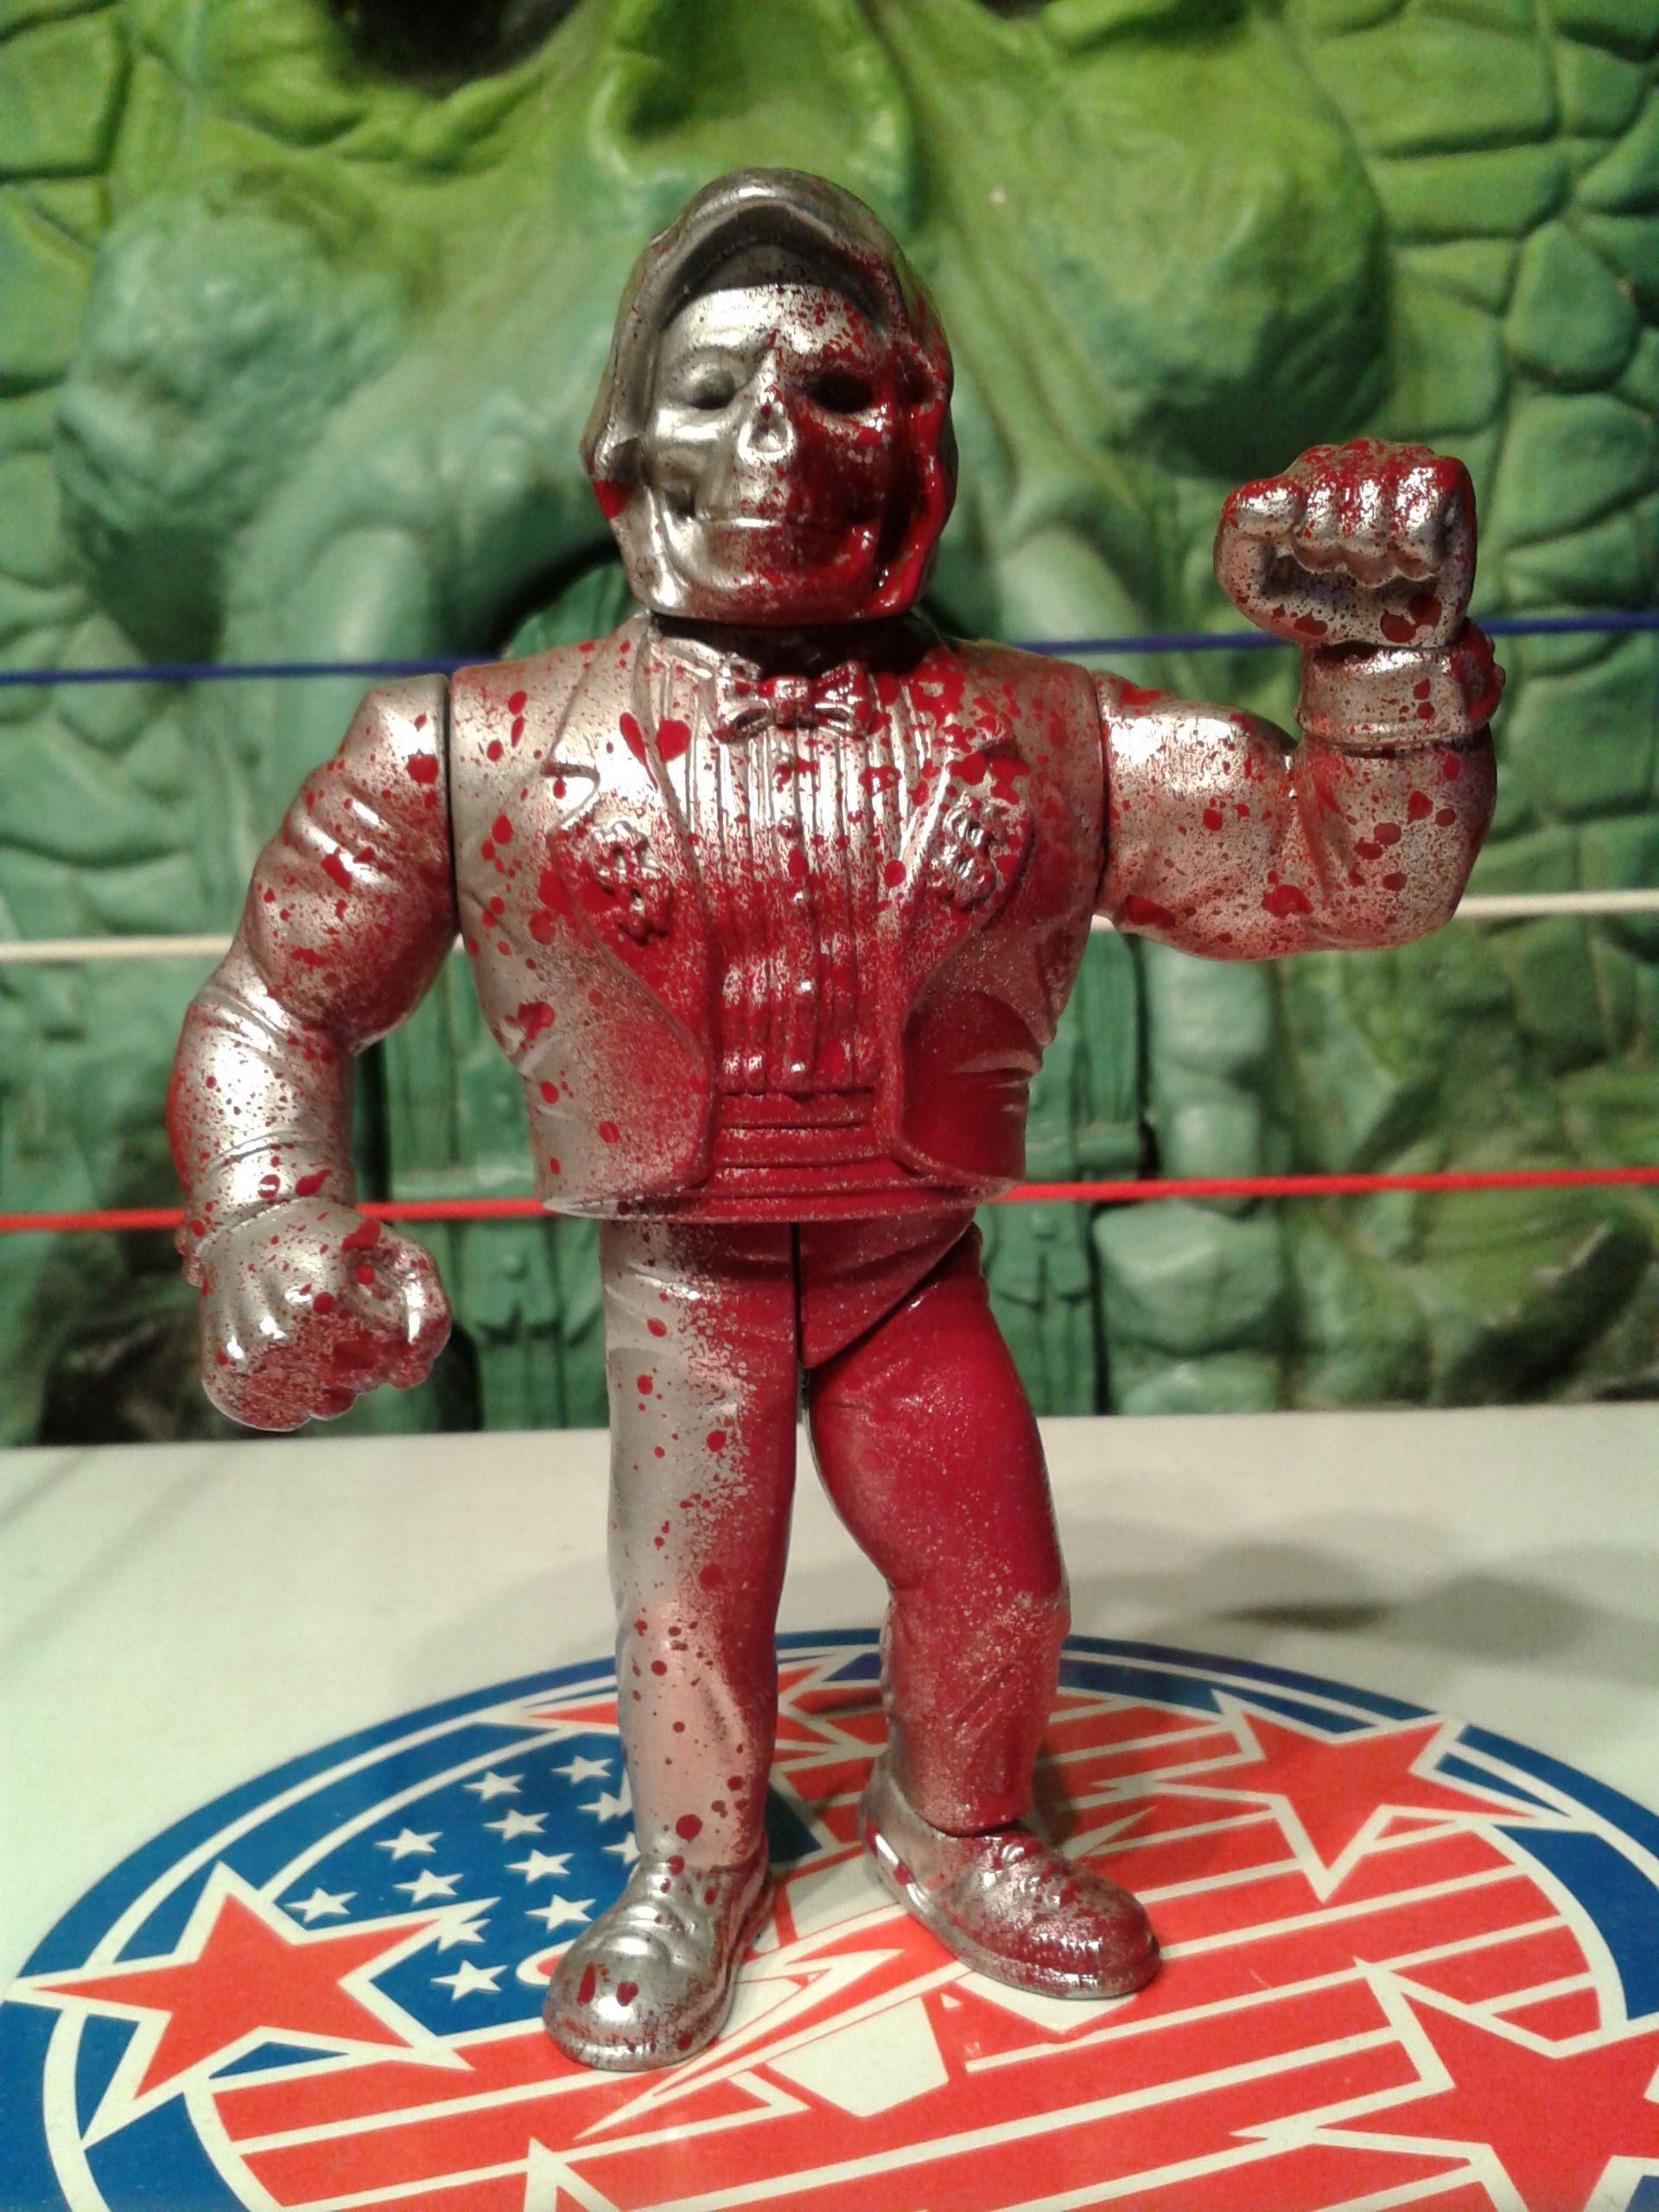 MotU + Wrestler = WotU ?!  Awesome!